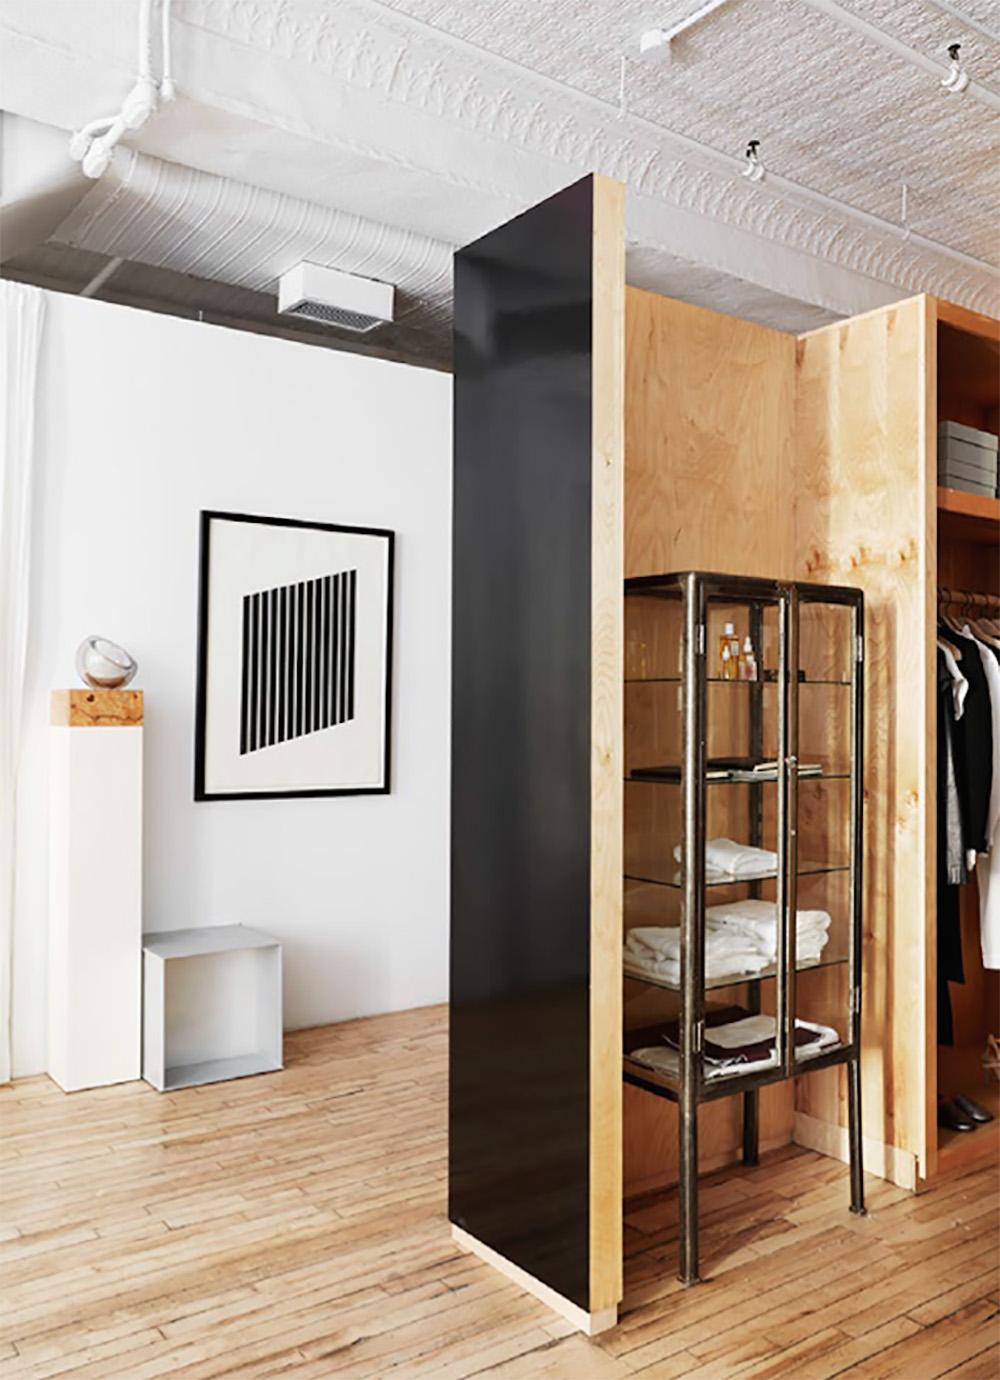 Soho_theline_apartment_DW2